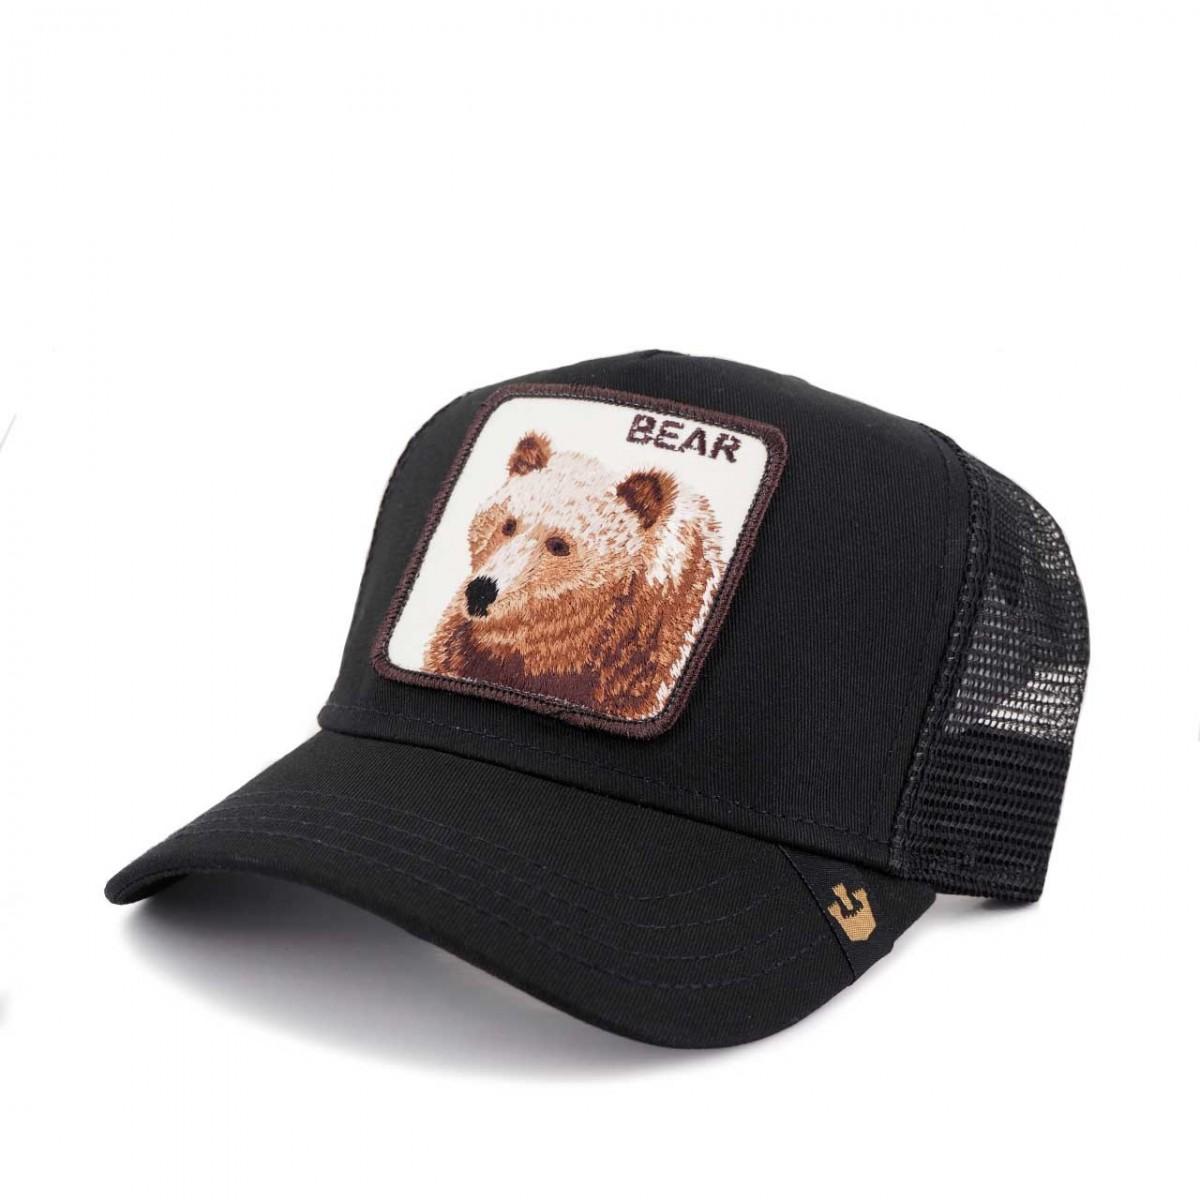 3235cefe Goorin Bros. | Black Bear Baseball Hat | GOB_101-9483-BK